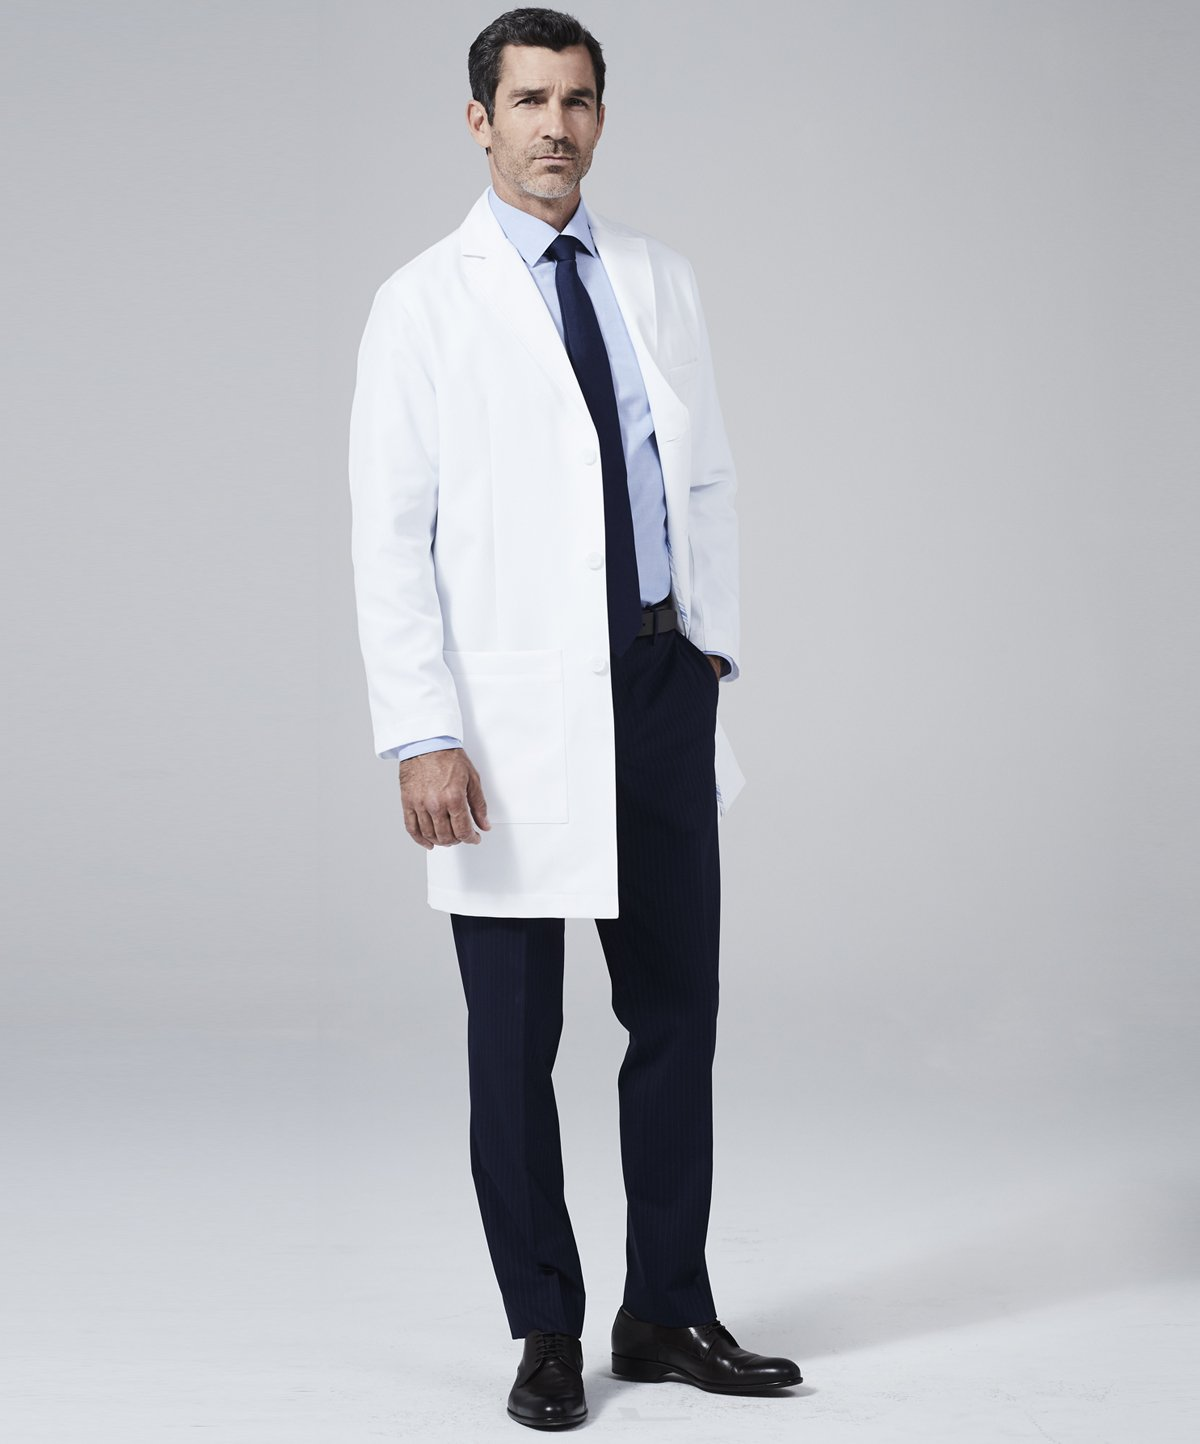 Medelita Men's Laennec Classic Fit M3 - Size 48, White